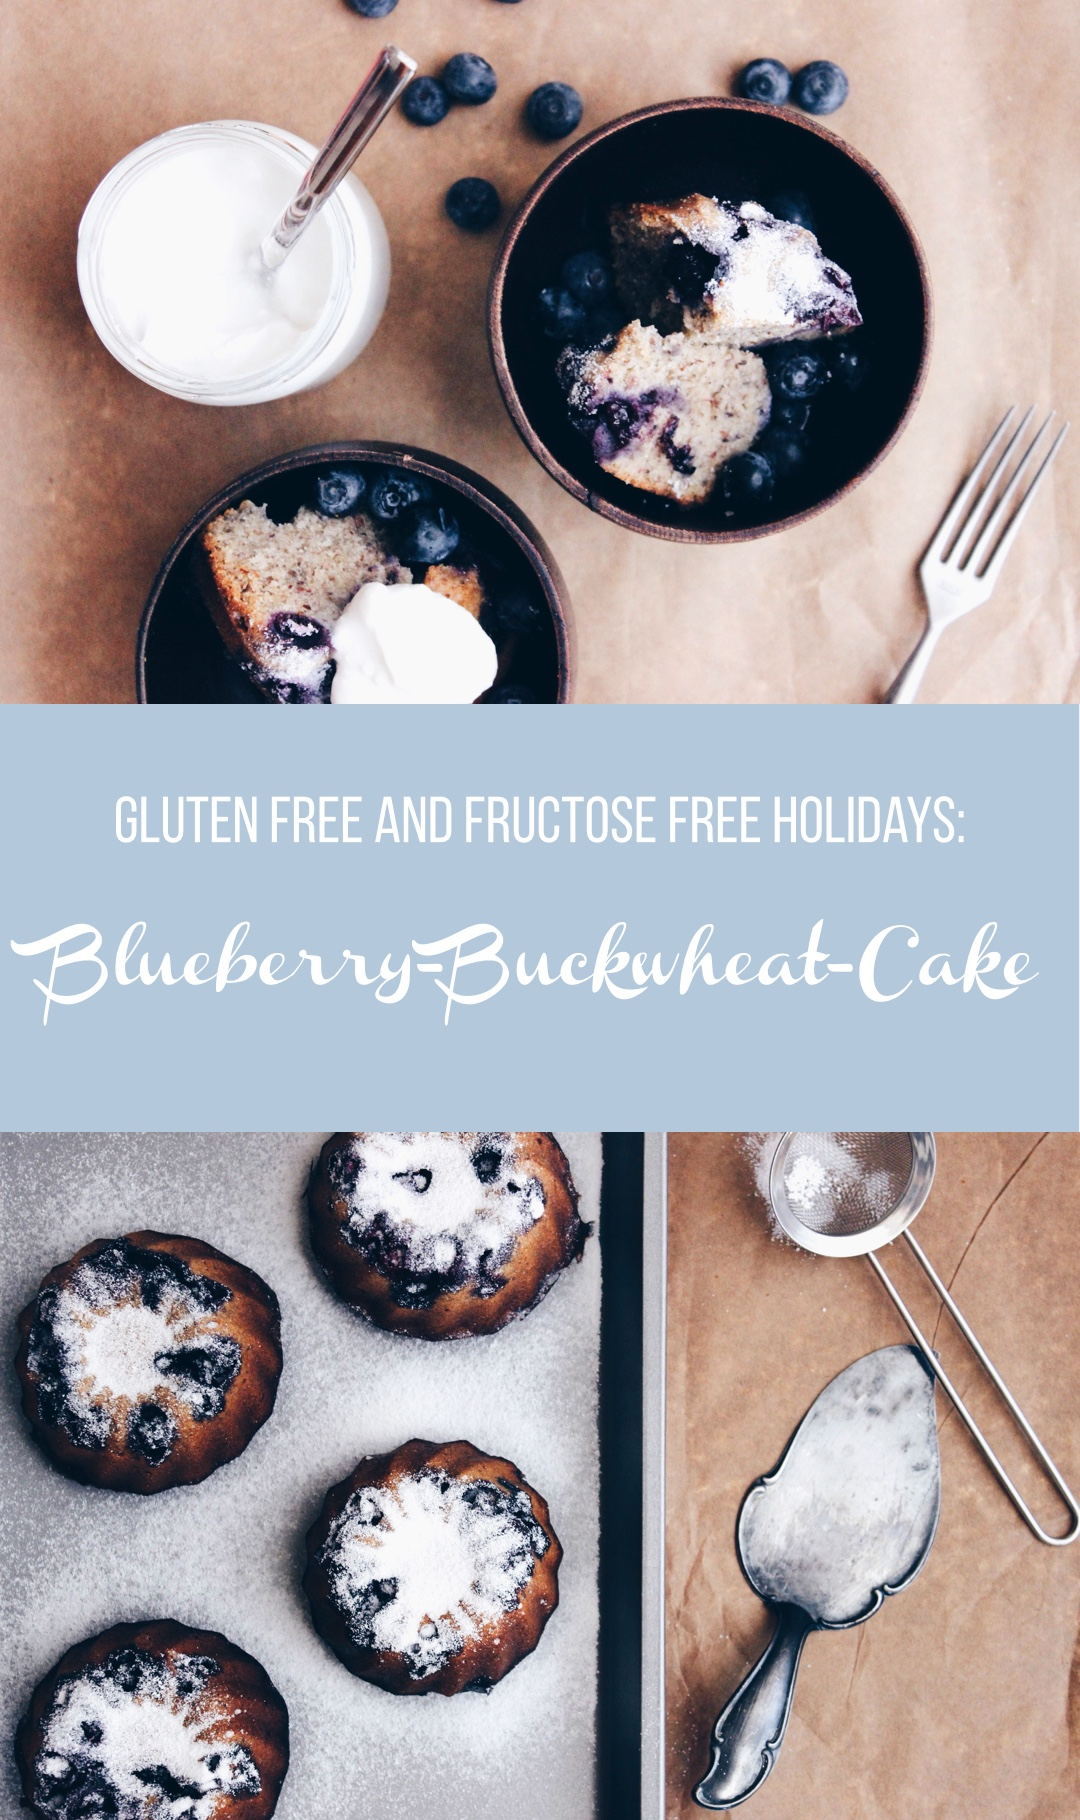 Gluten Free Easter Holidays: Fructosefree Blueberry-Buckwheat-Cake with Lemon Curd // Gluten-freie Ostern: Fructosearmer Heidelbeer-Buchweizen-Kuchen mit Zitronencreme // by fructopia.de #freefrom #foodsensitivities #holidaybaking